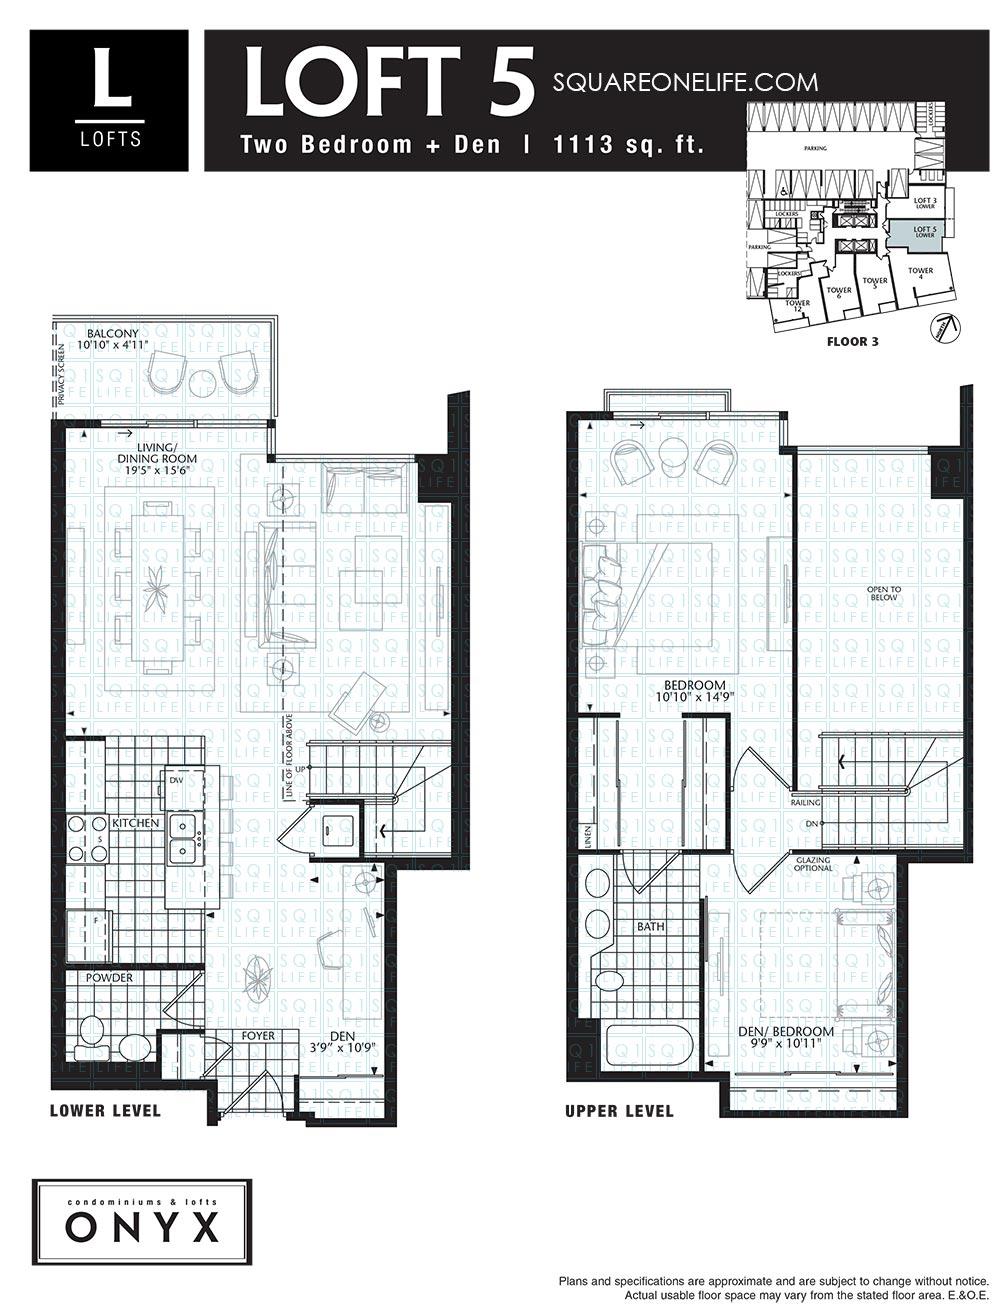 223-Webb-Dr-Onyx-Condo-Floorplan-Loft-5-2-Bed-1-Den onyx condo Onyx Condo 223 Webb Dr Onyx Condo Floorplan Loft 5 2 Bed 1 Den